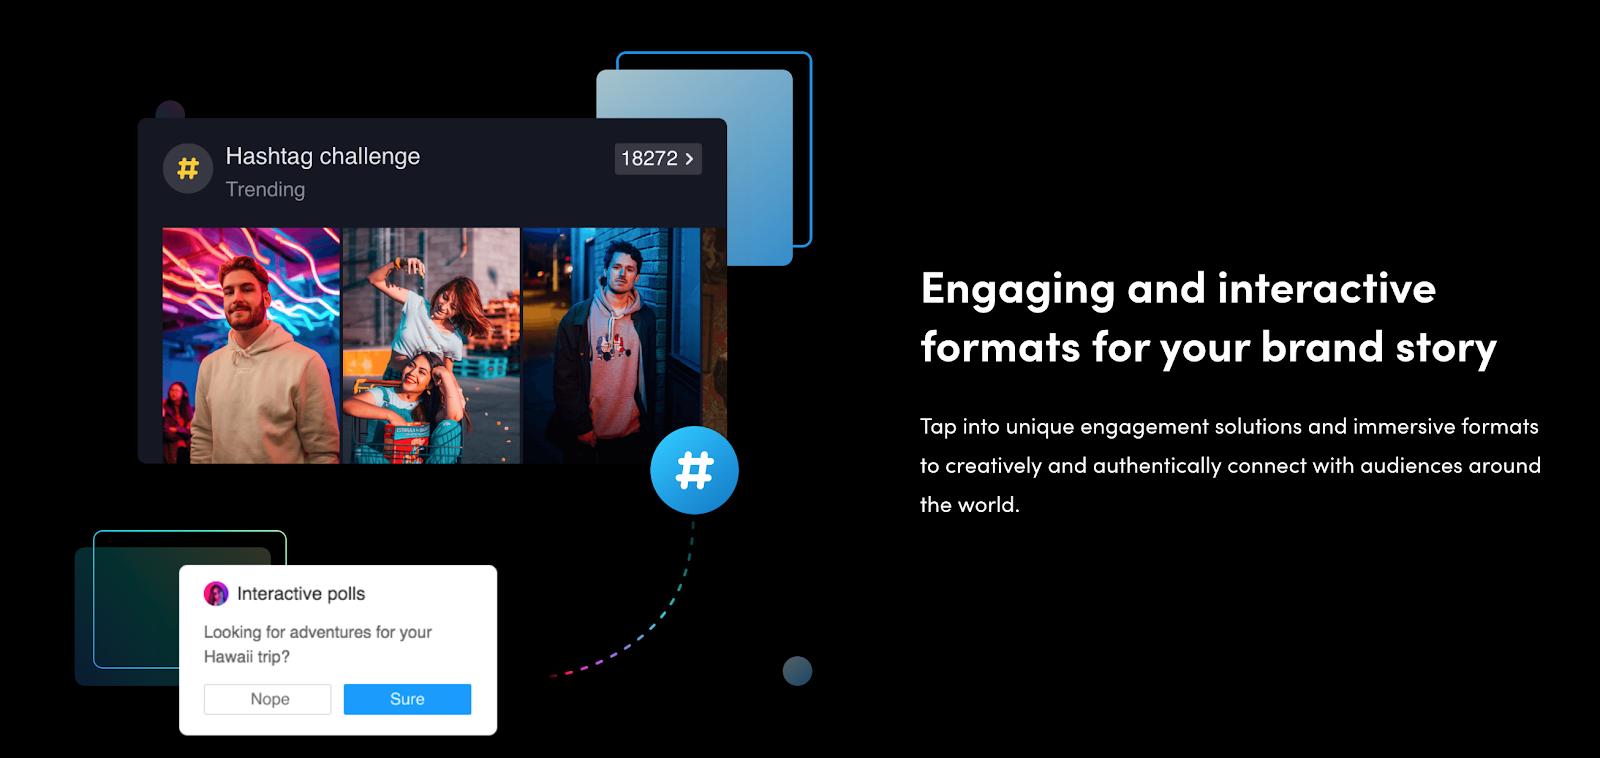 TikTok Example Hashtag Challenge Ad